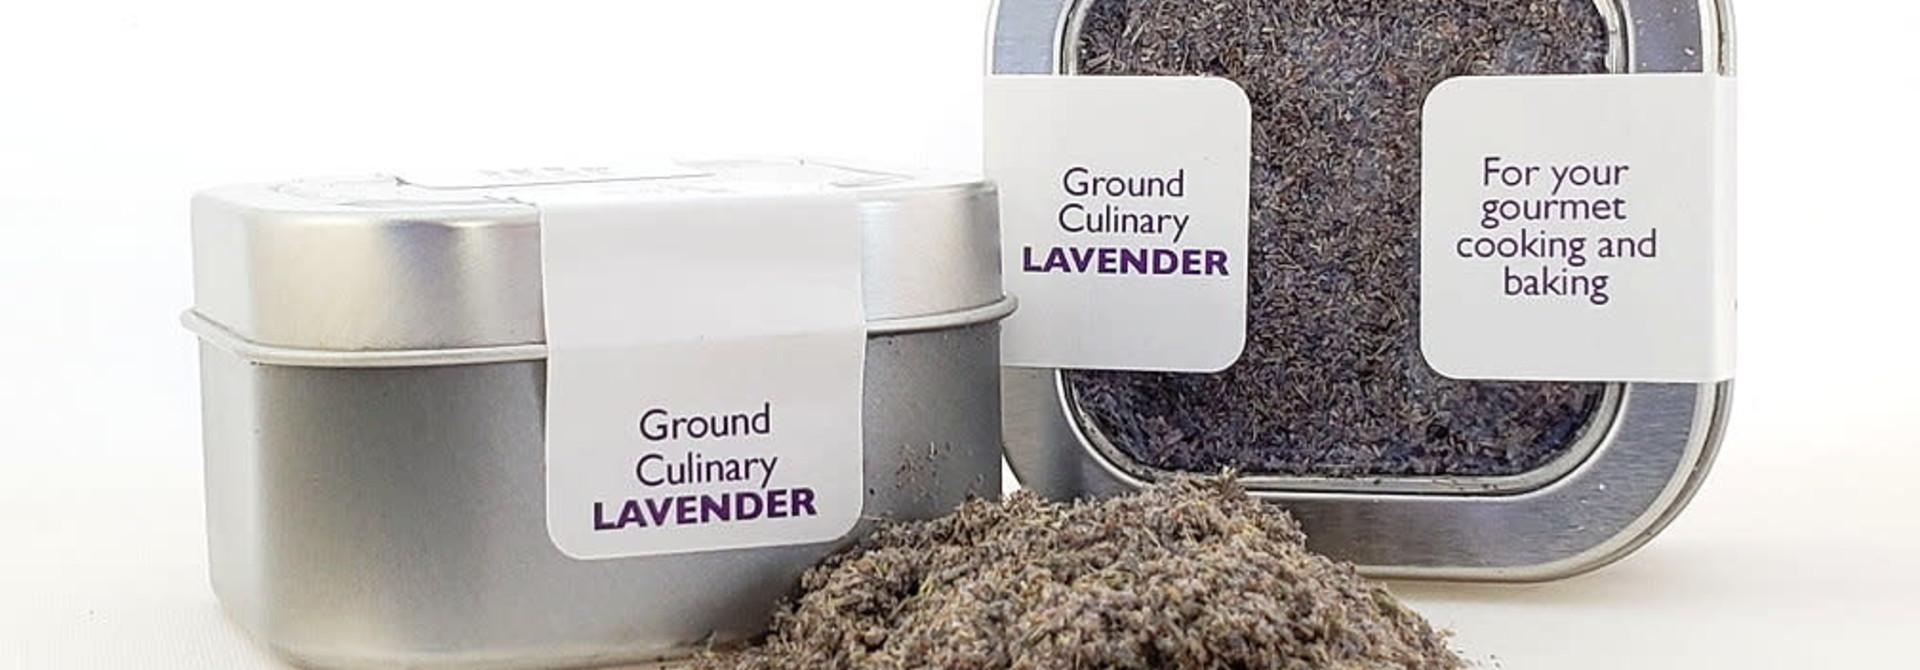 Culinary Lavender, ground, .7 oz tin